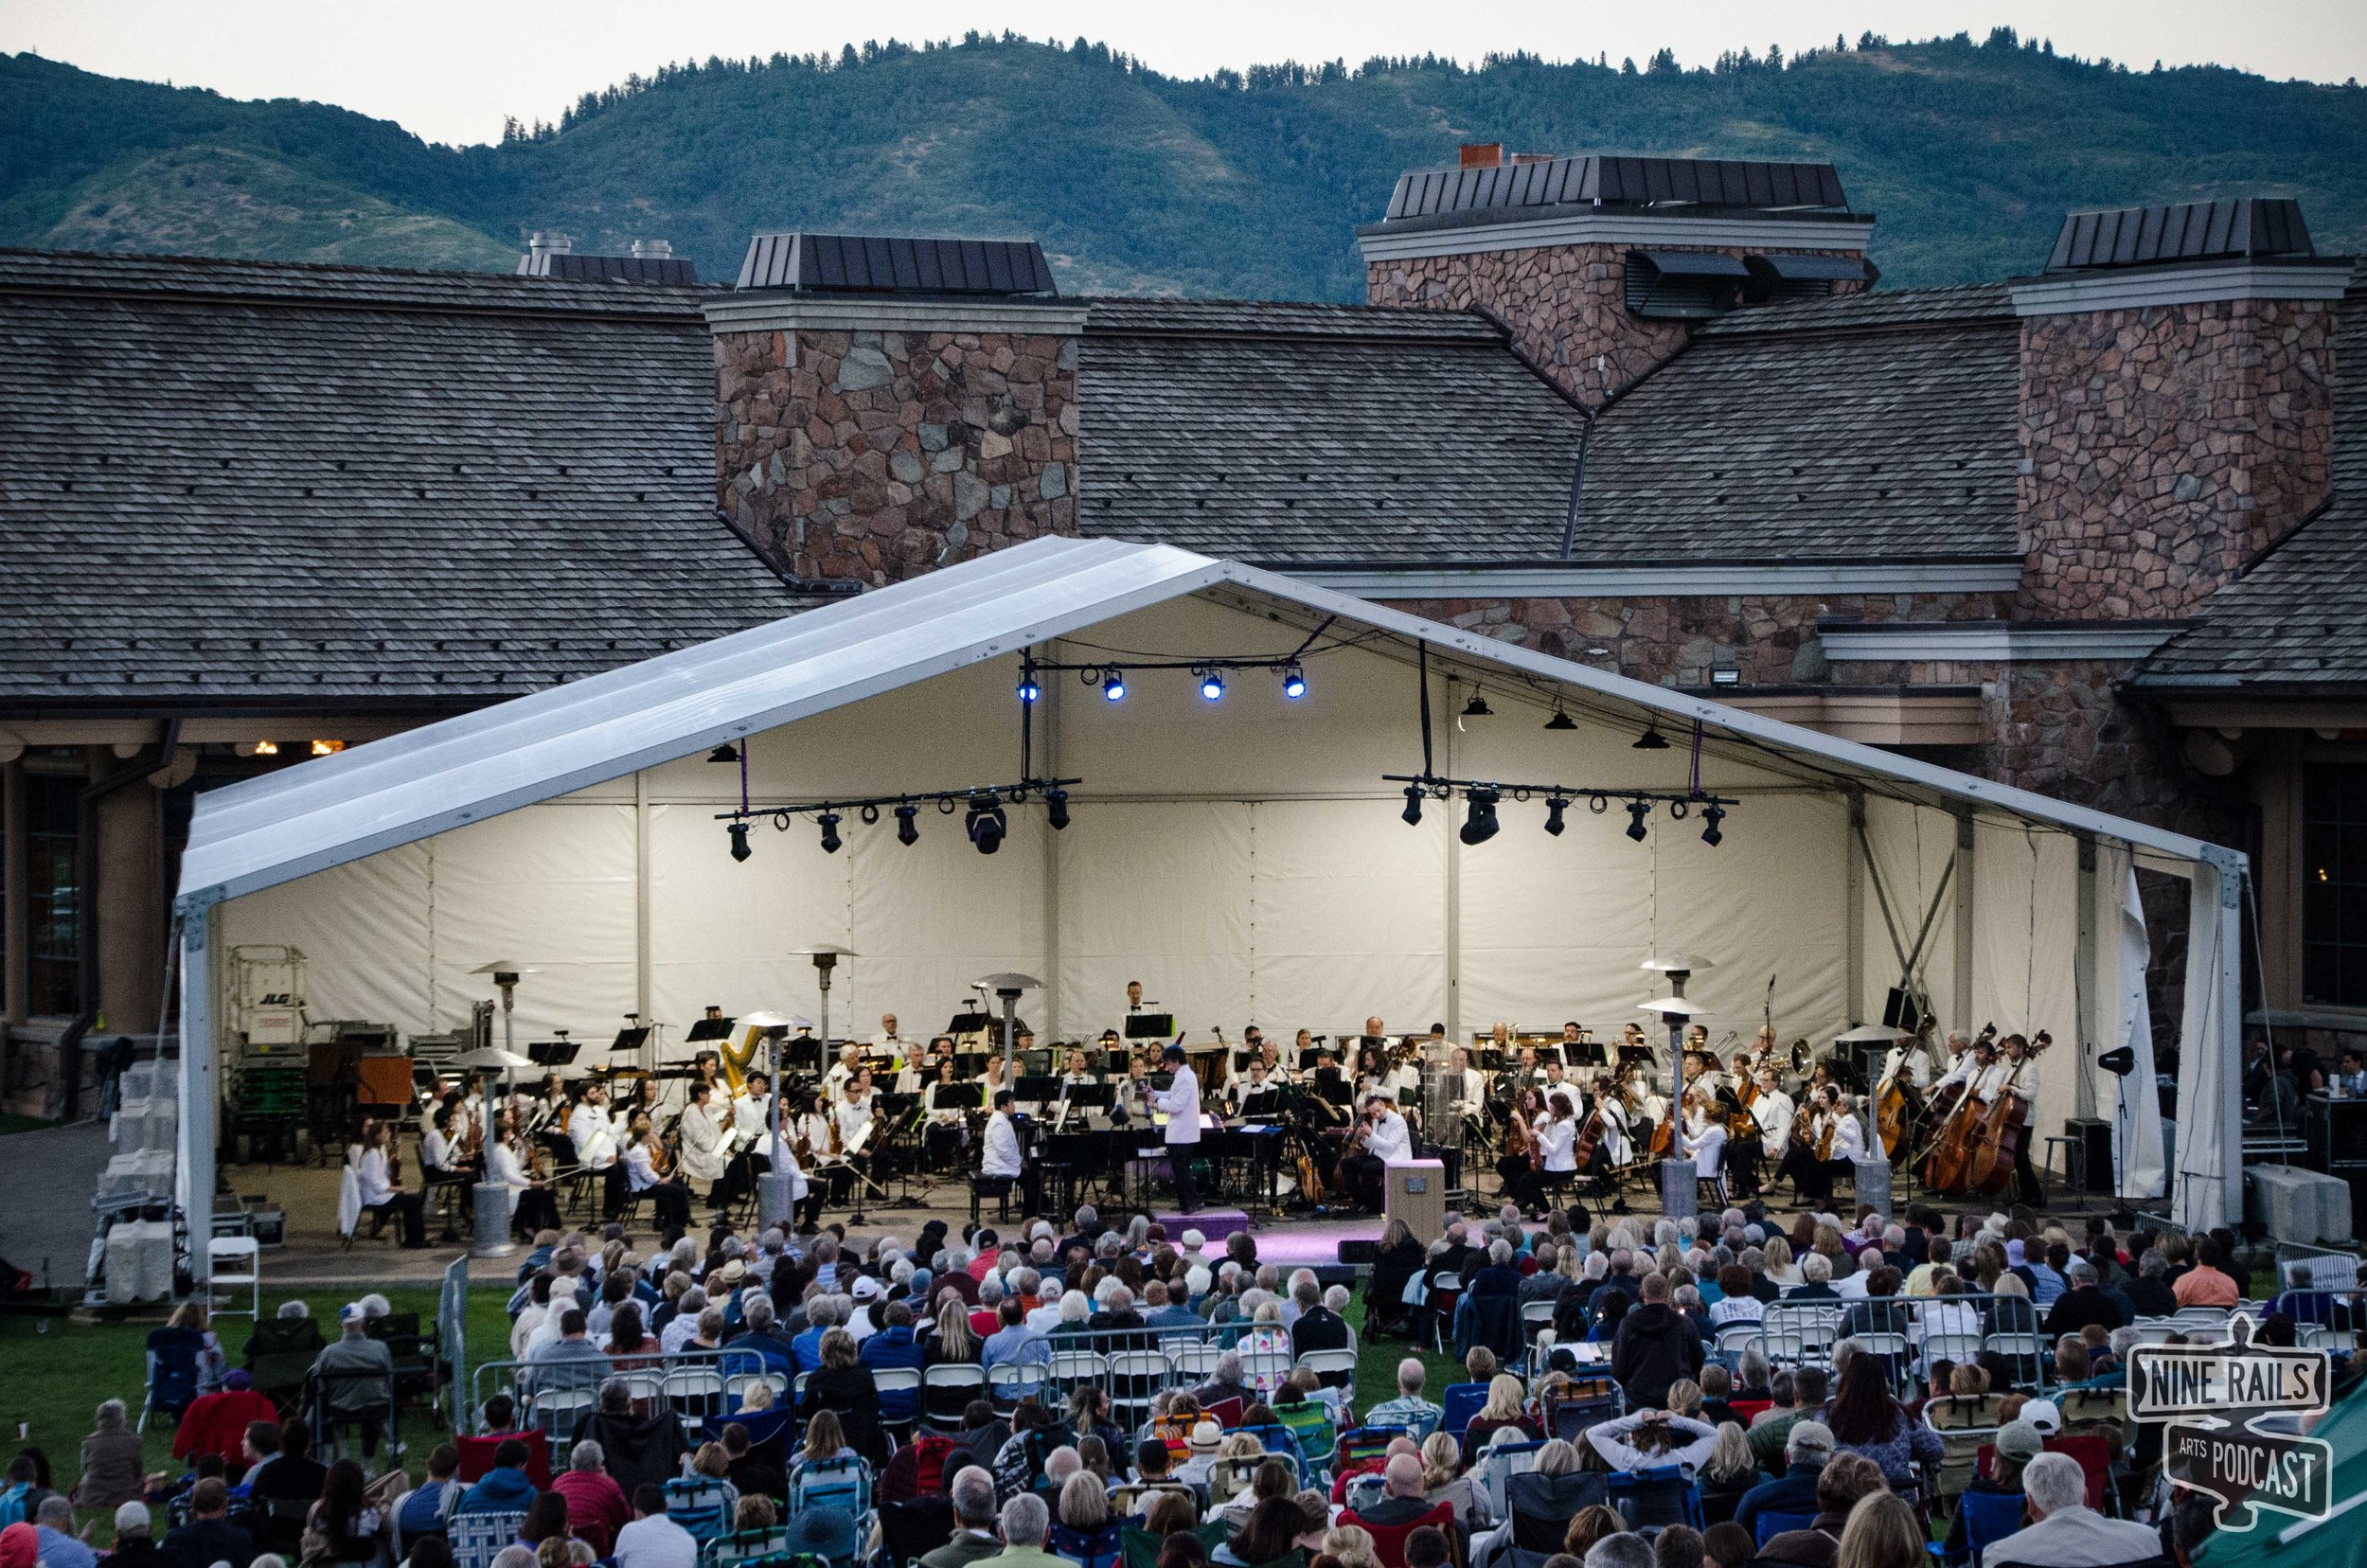 Ogden Symphony Ballet Association's Frank Sinatra and Ella Fitzgerald concert under the stars at Snowbasin Resort